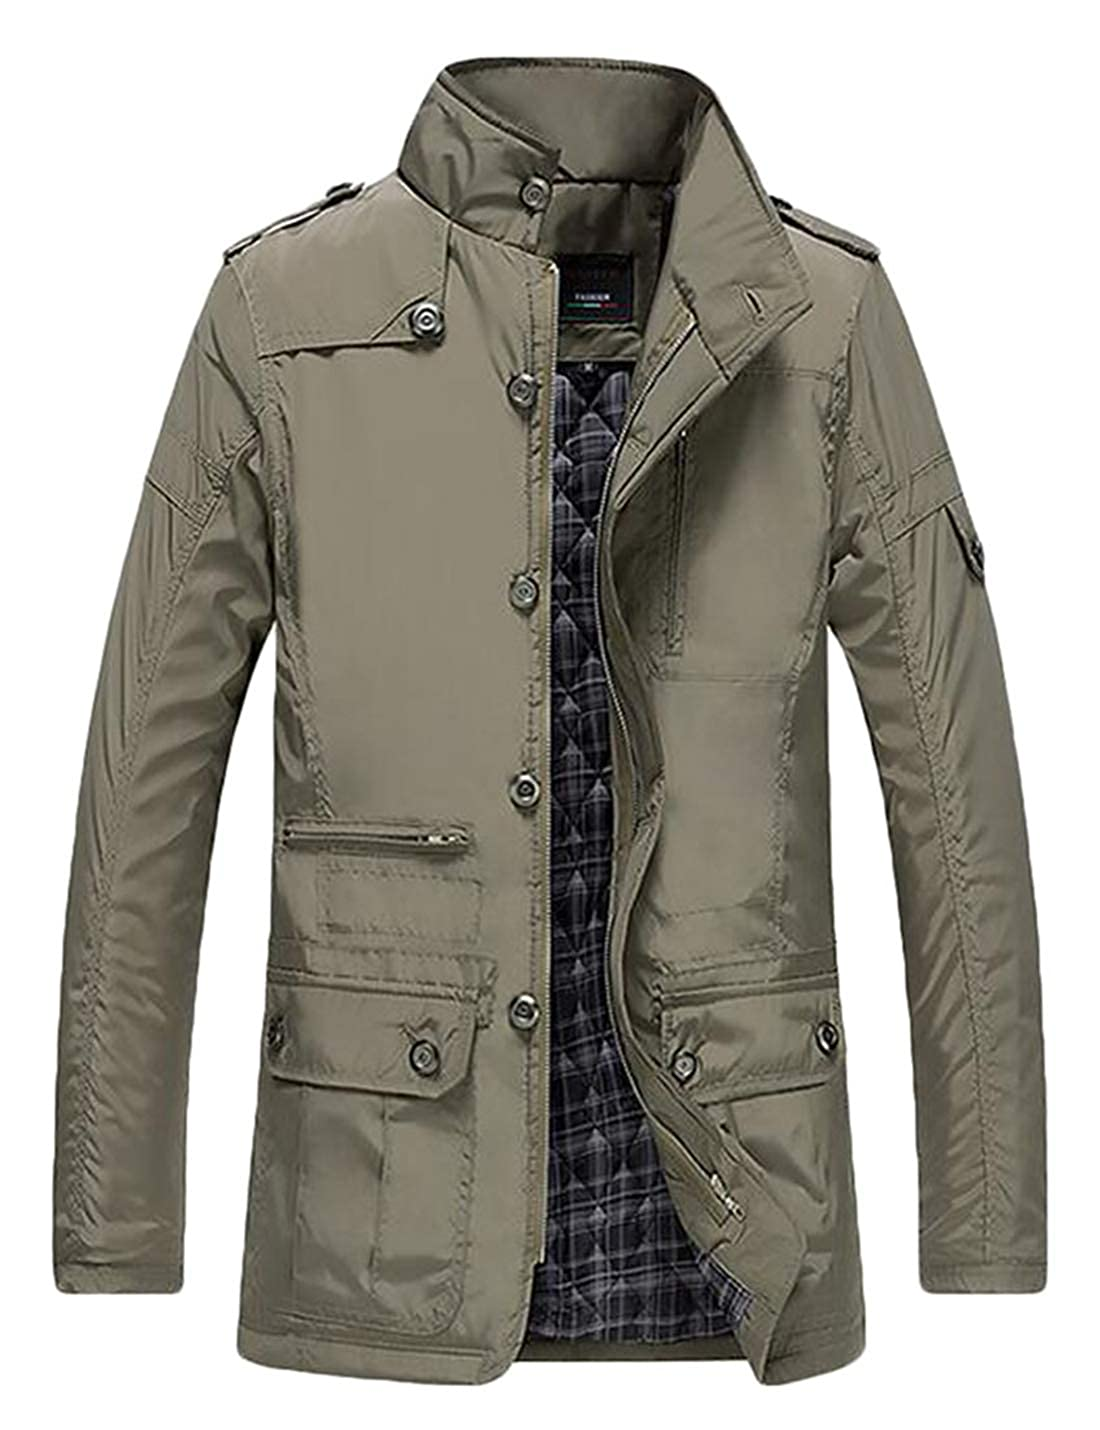 XTX Mens Winter Stand Collar Warm Thicken Quilted Windbreaker Outerwear Jackets Khaki 4XL